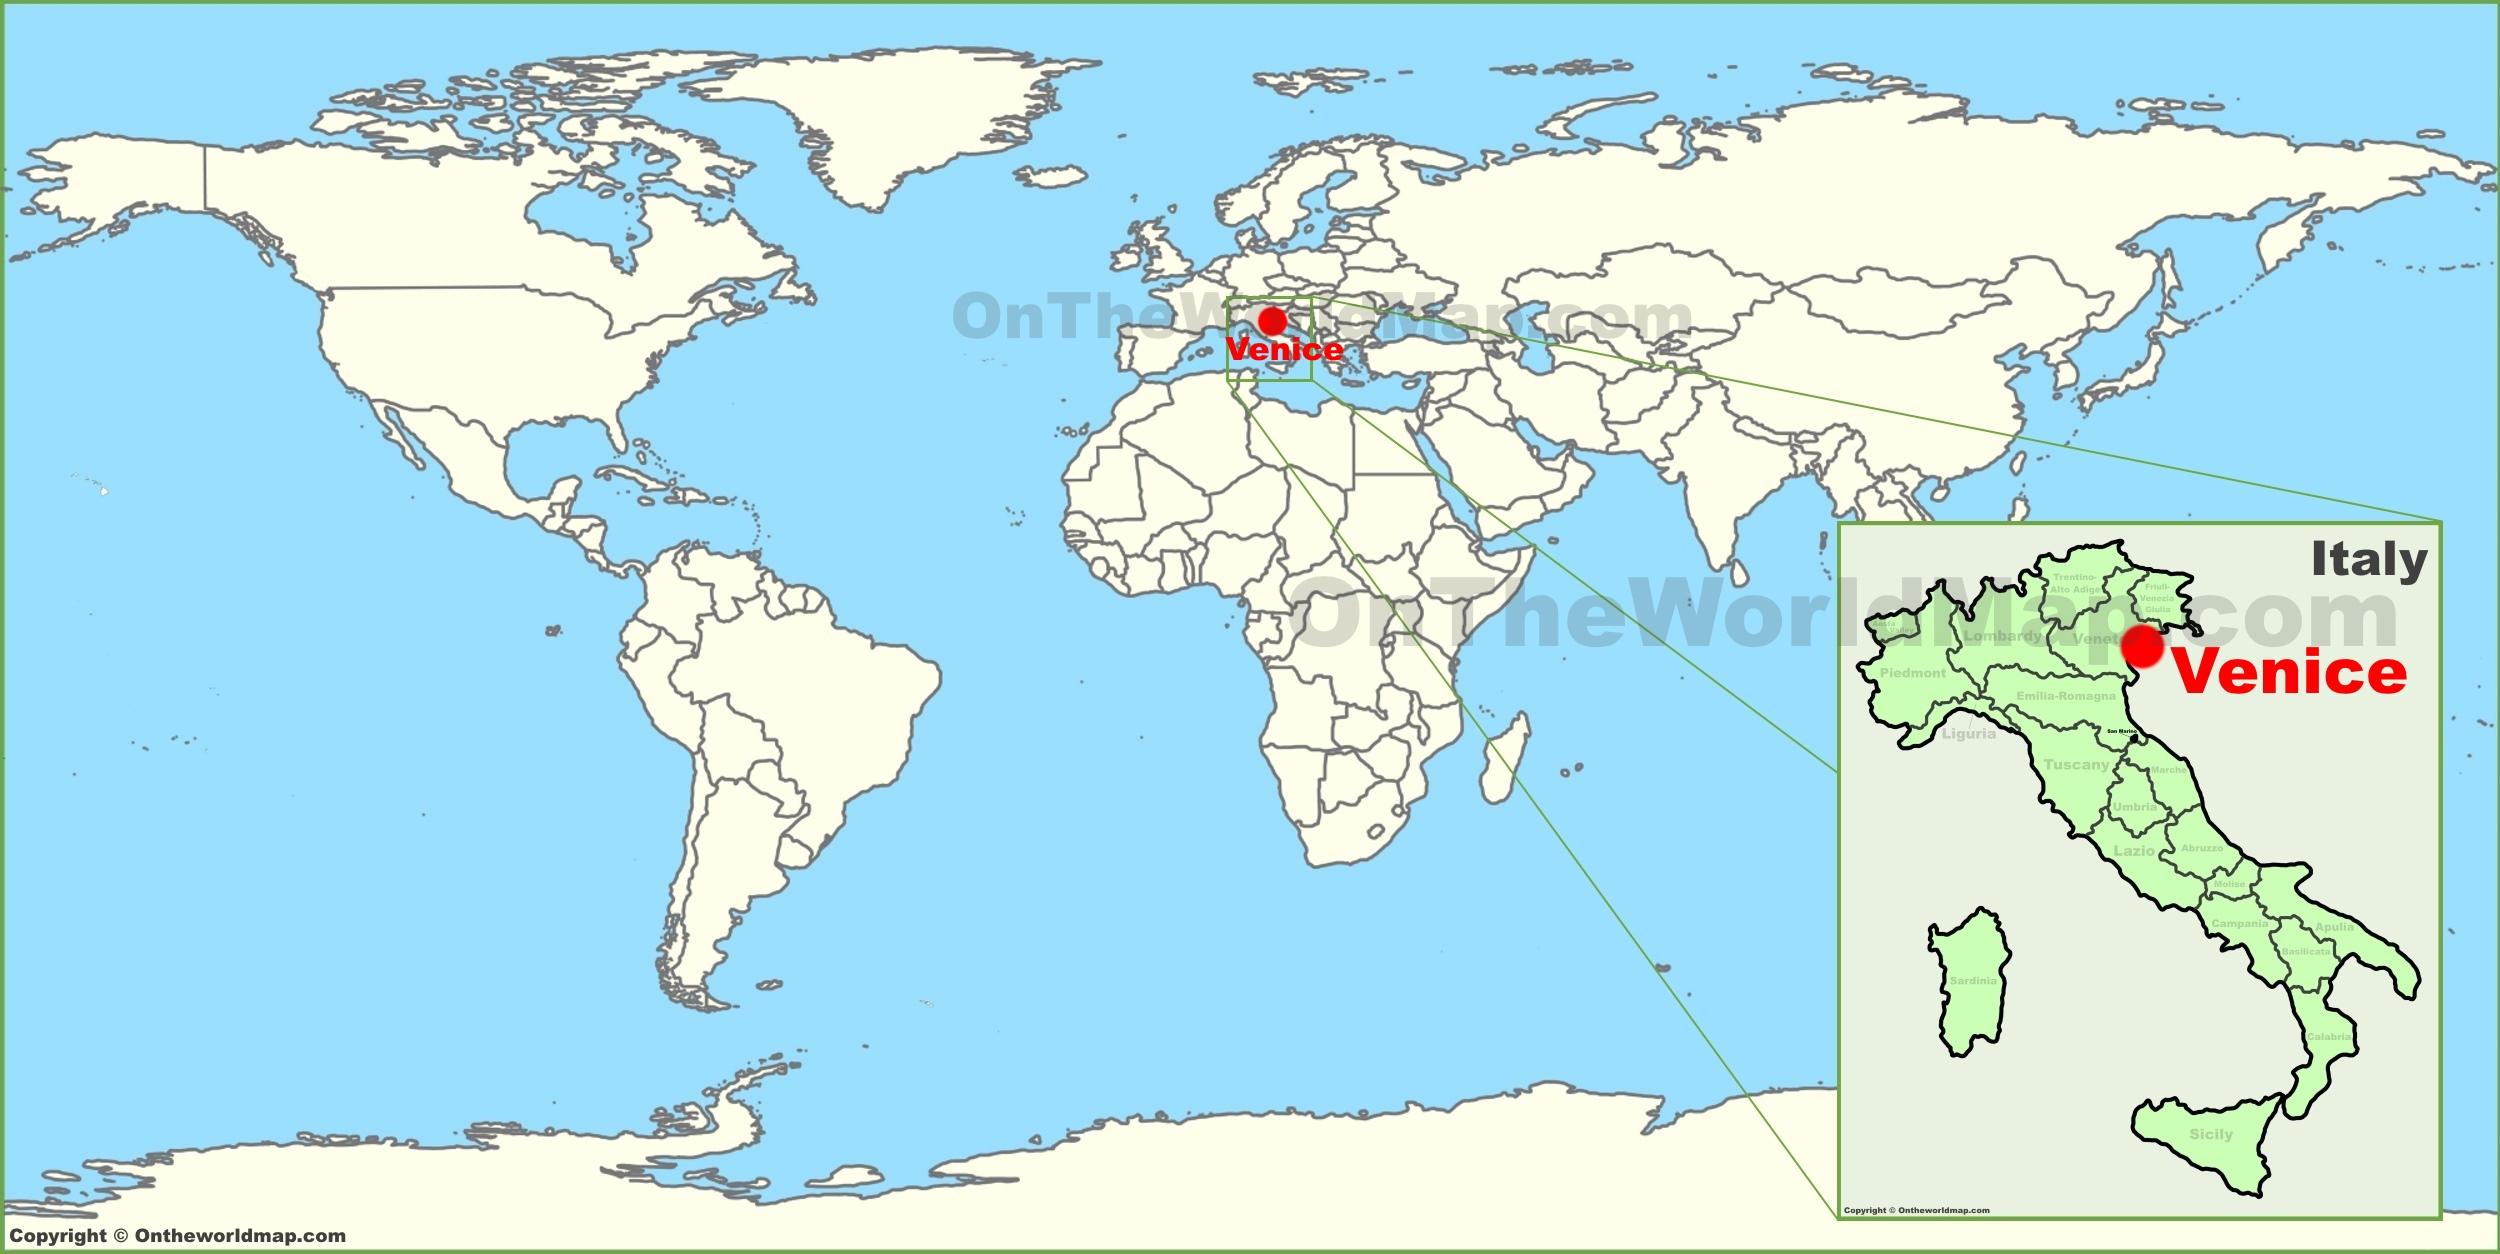 Venice On Map - 14.11.kaartenstemp.nl • - Venice Beach Florida Map